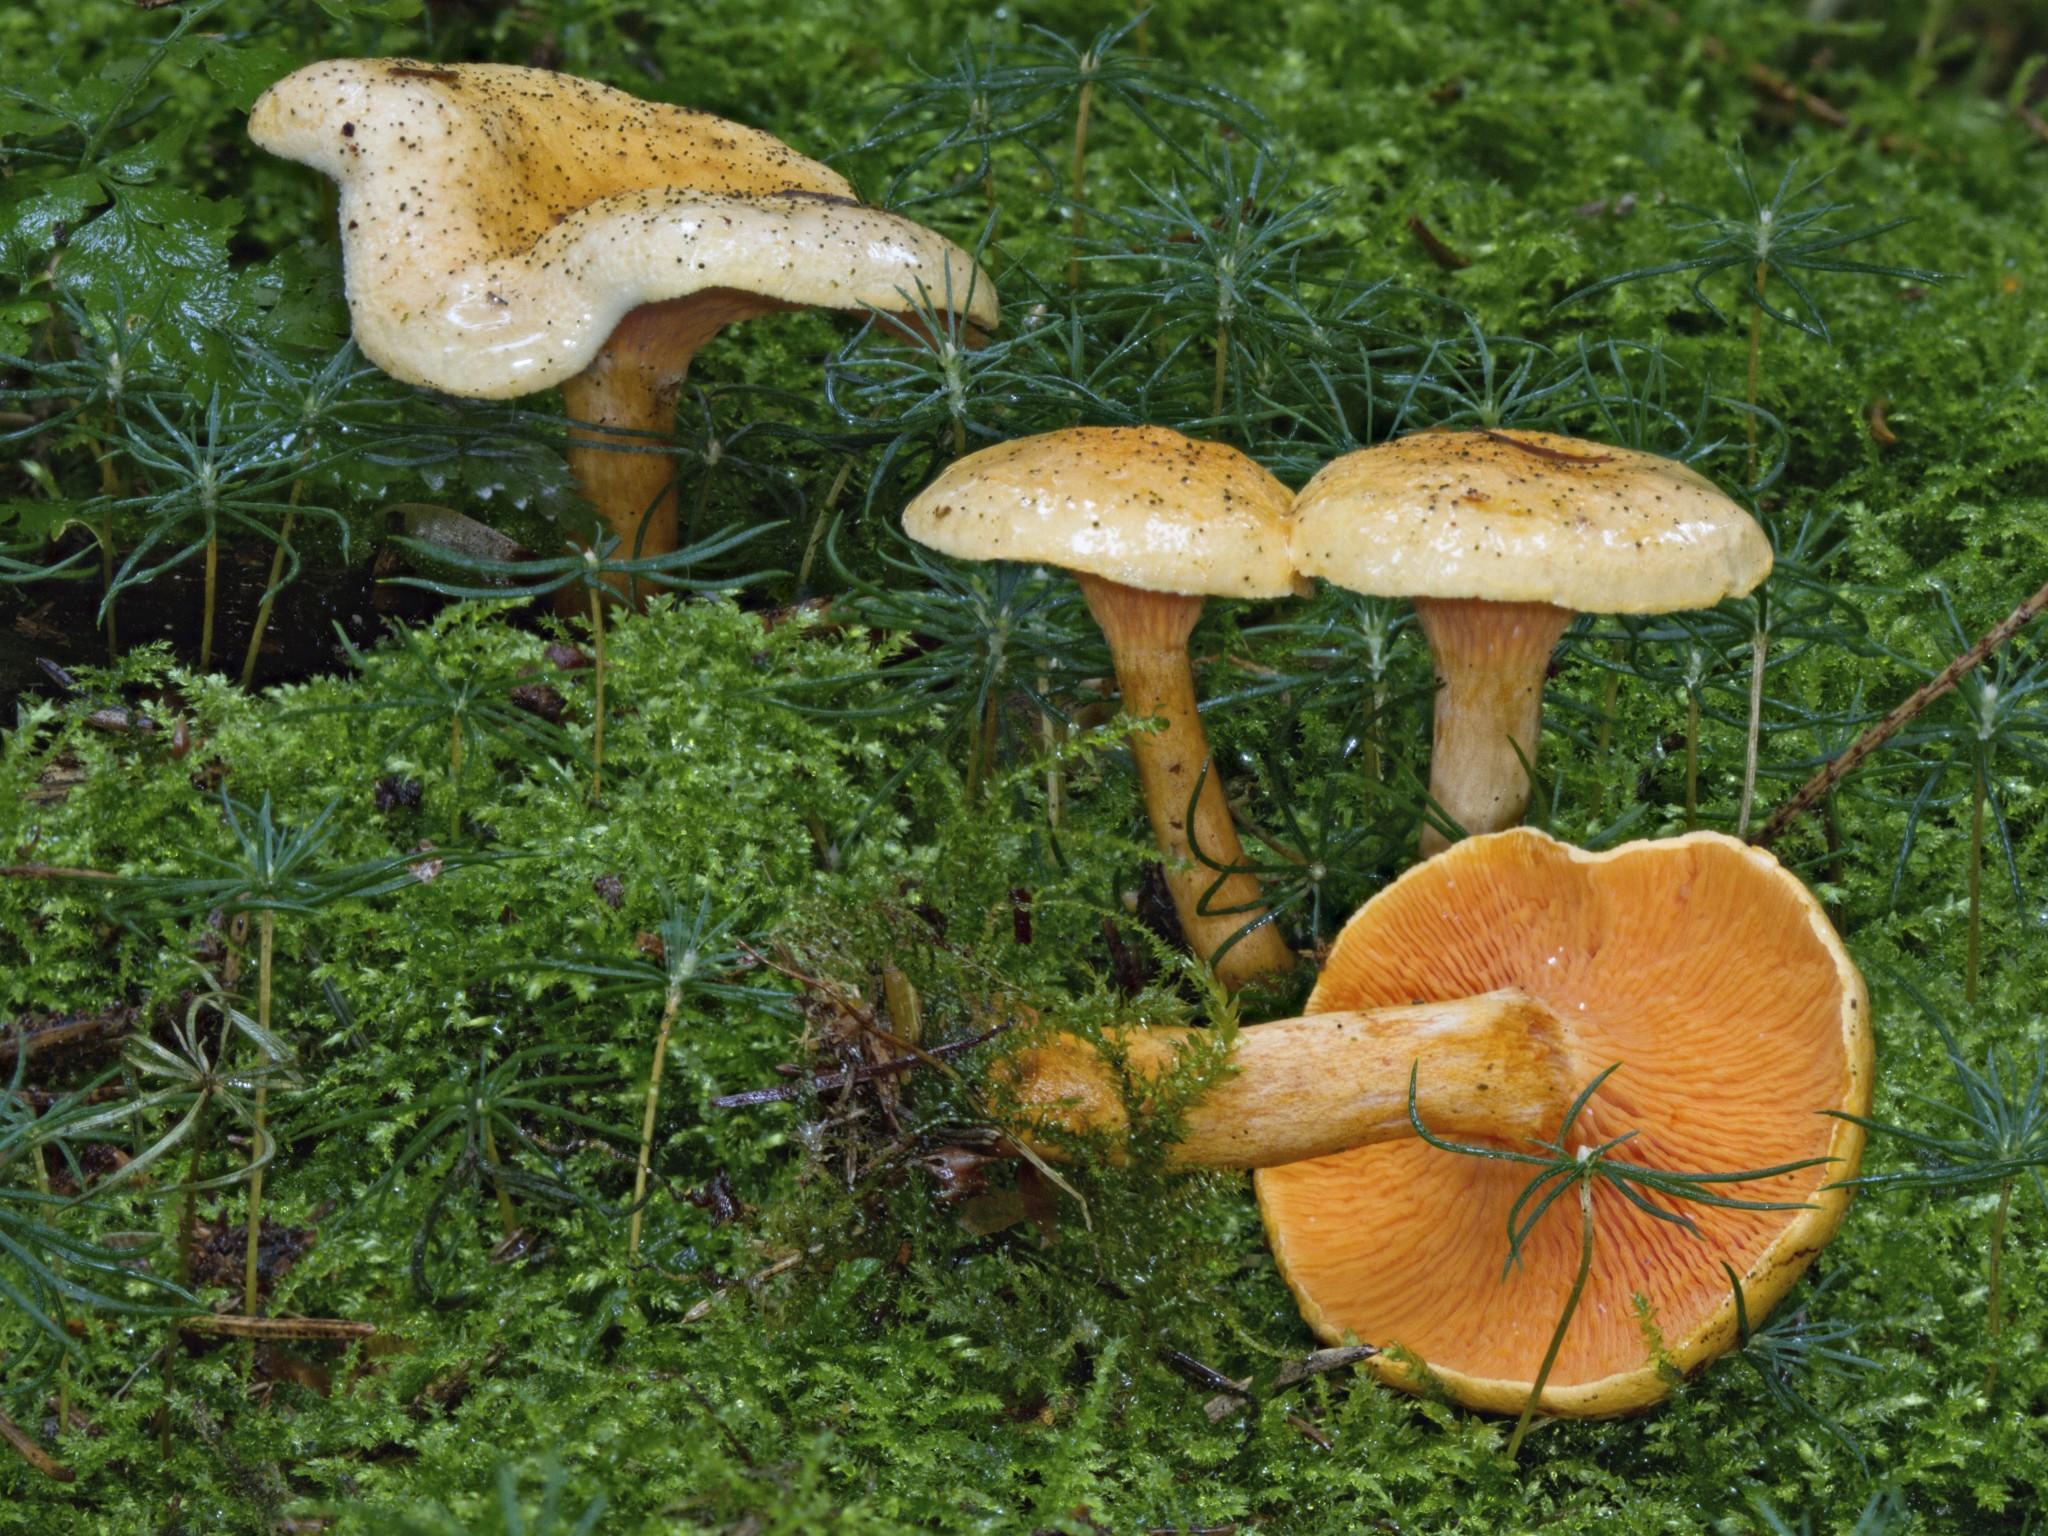 pilze sammeln giftige pilze und essbare pilze bestimmen. Black Bedroom Furniture Sets. Home Design Ideas